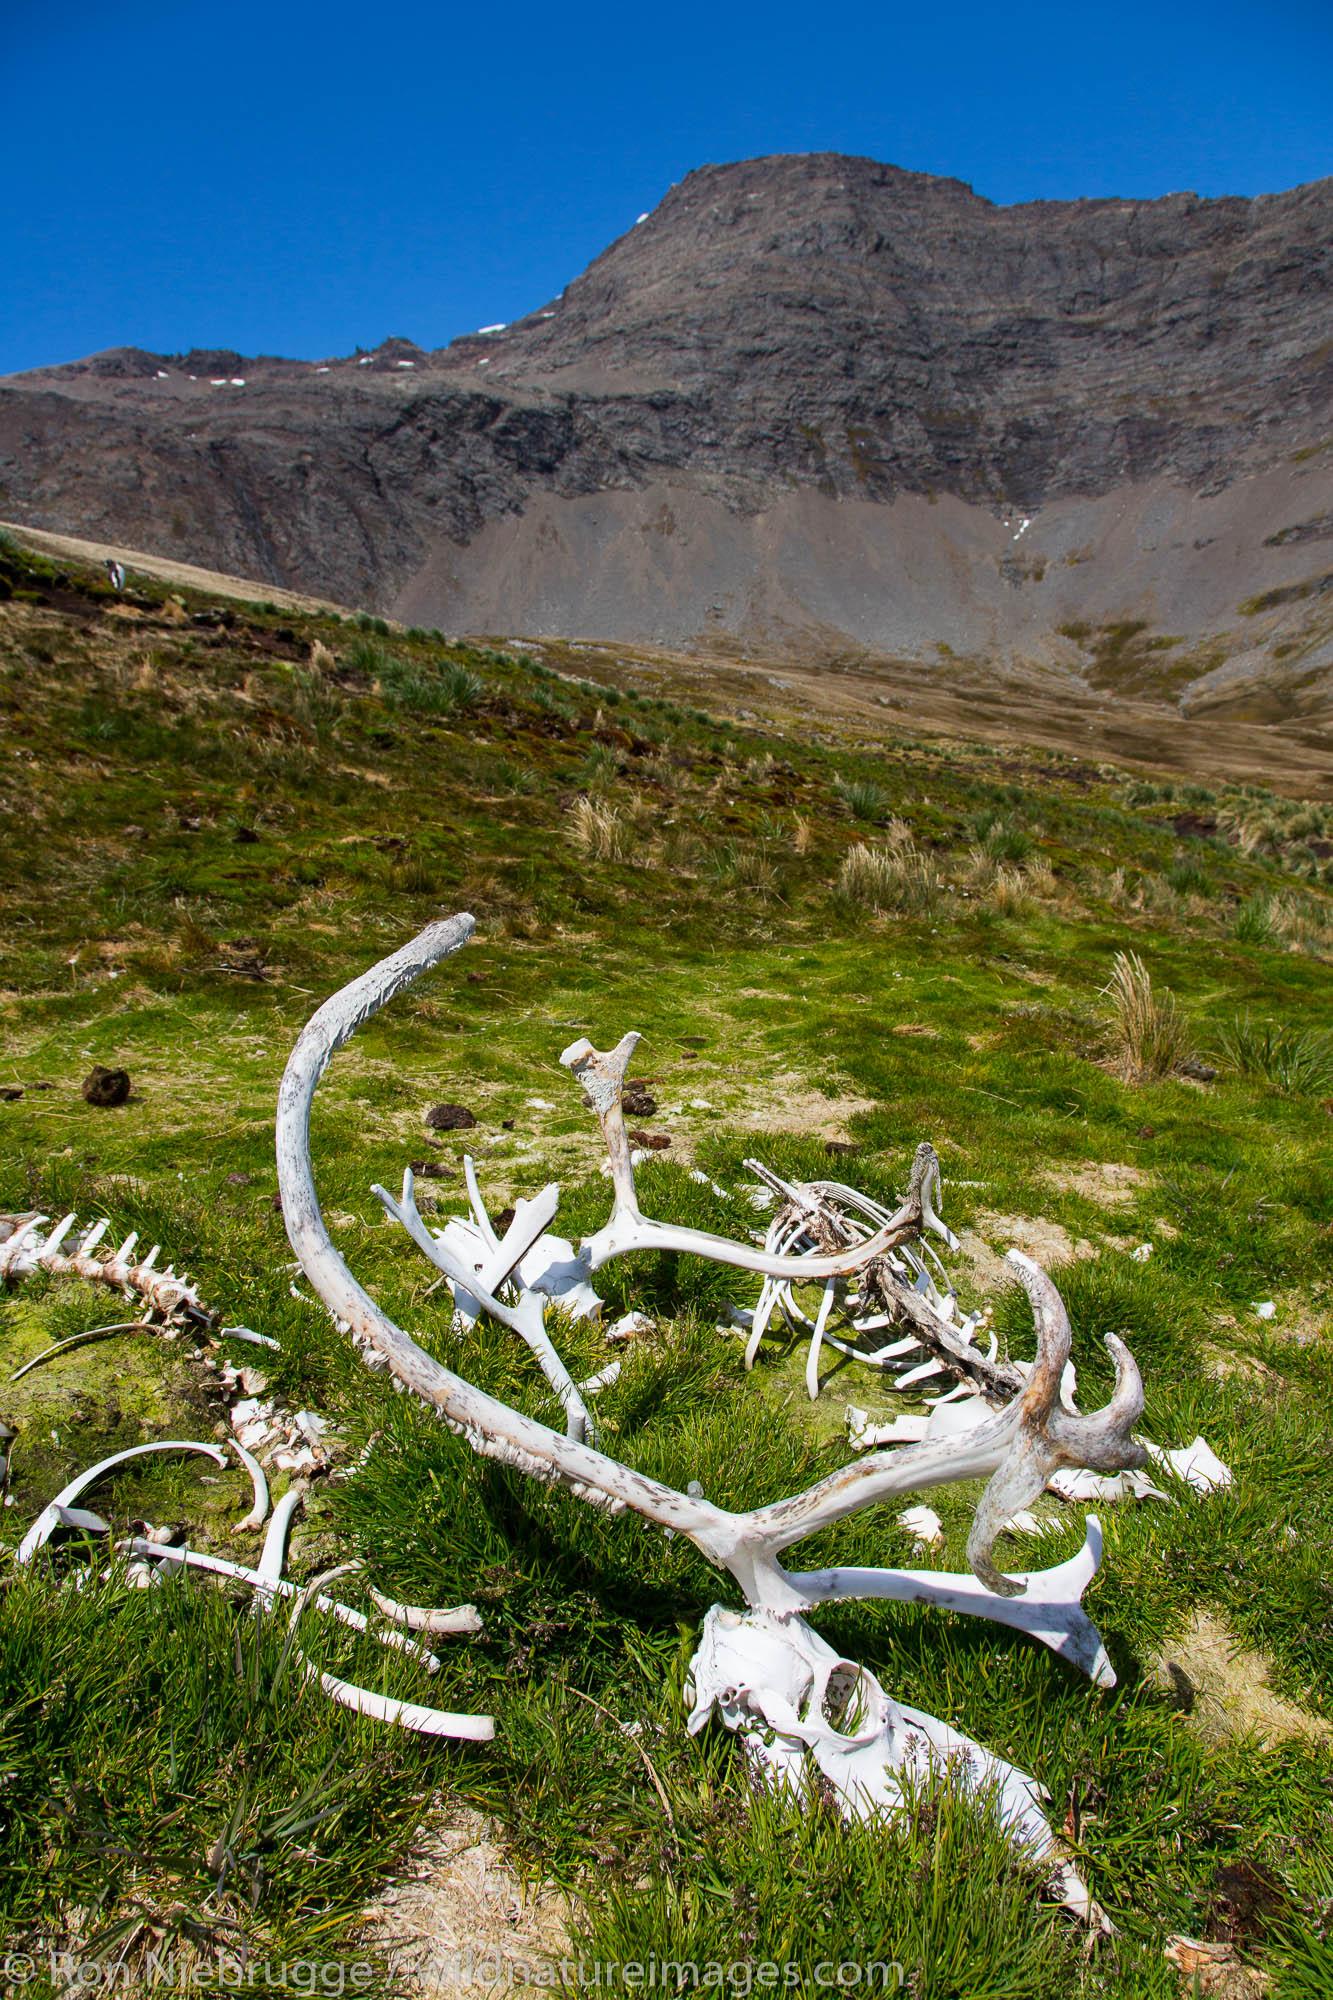 Reindeer bones, Godthul Bay, South Georgia, Antarctica.